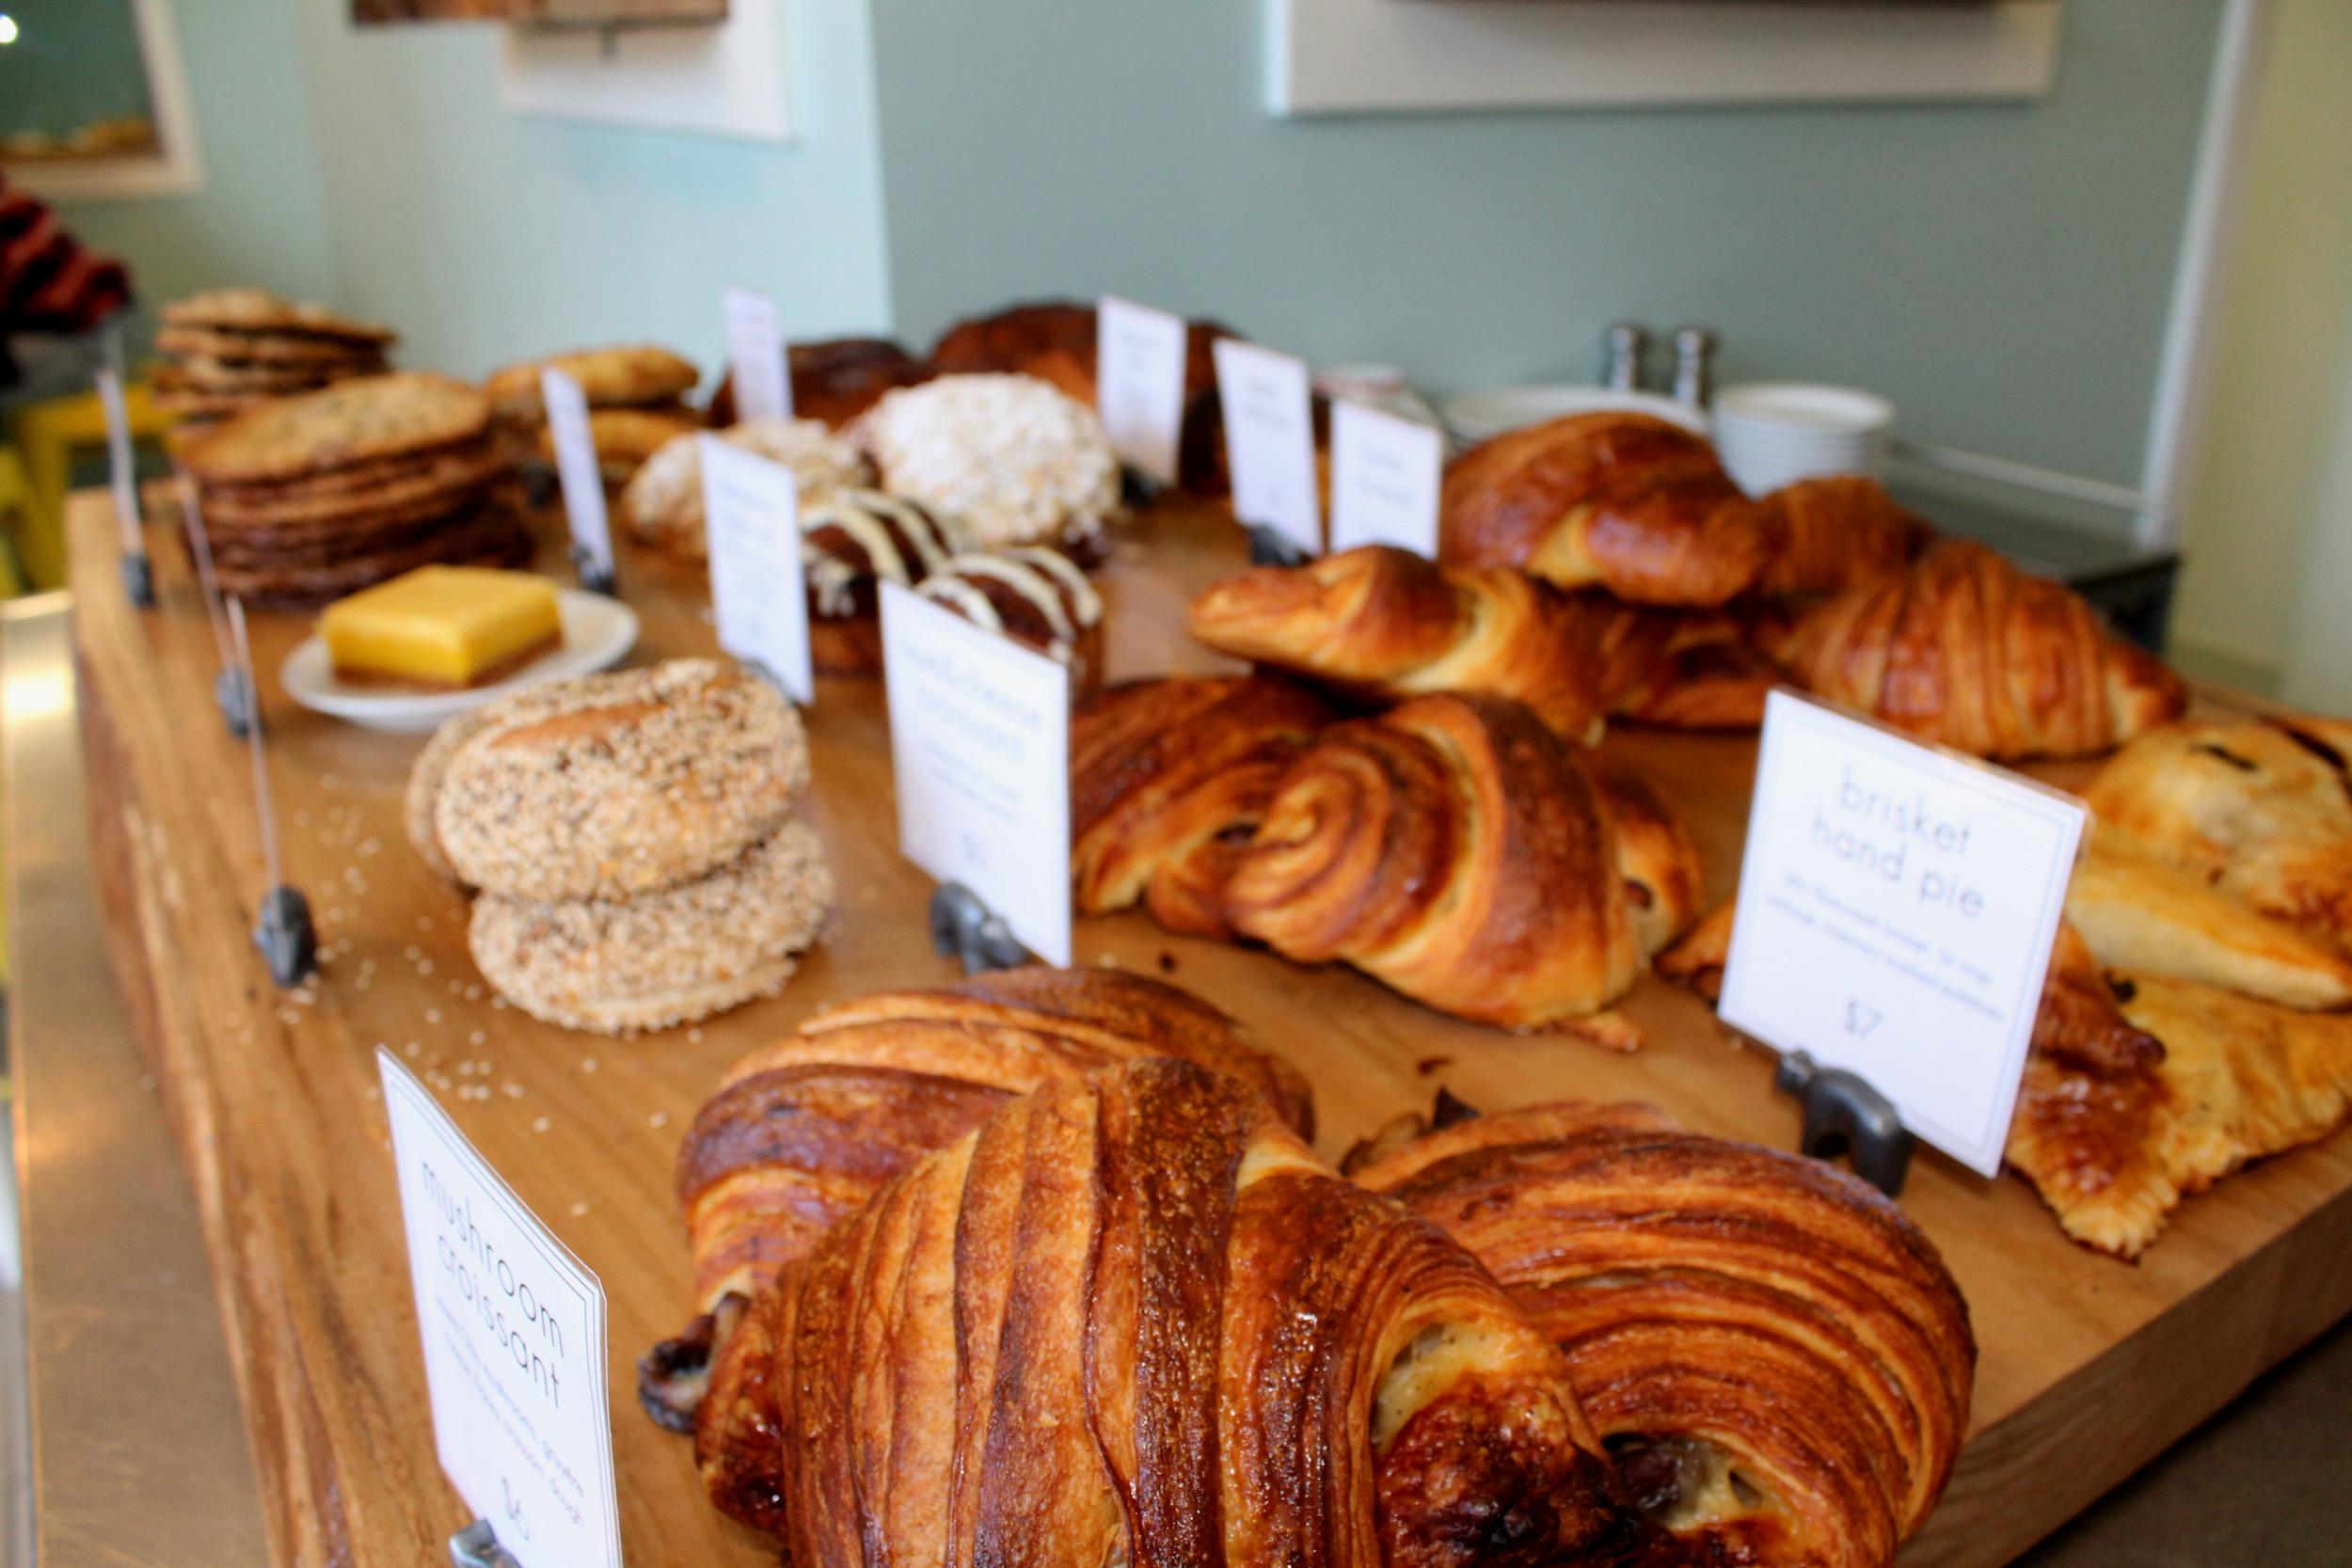 Pastries, pastries, pastries.